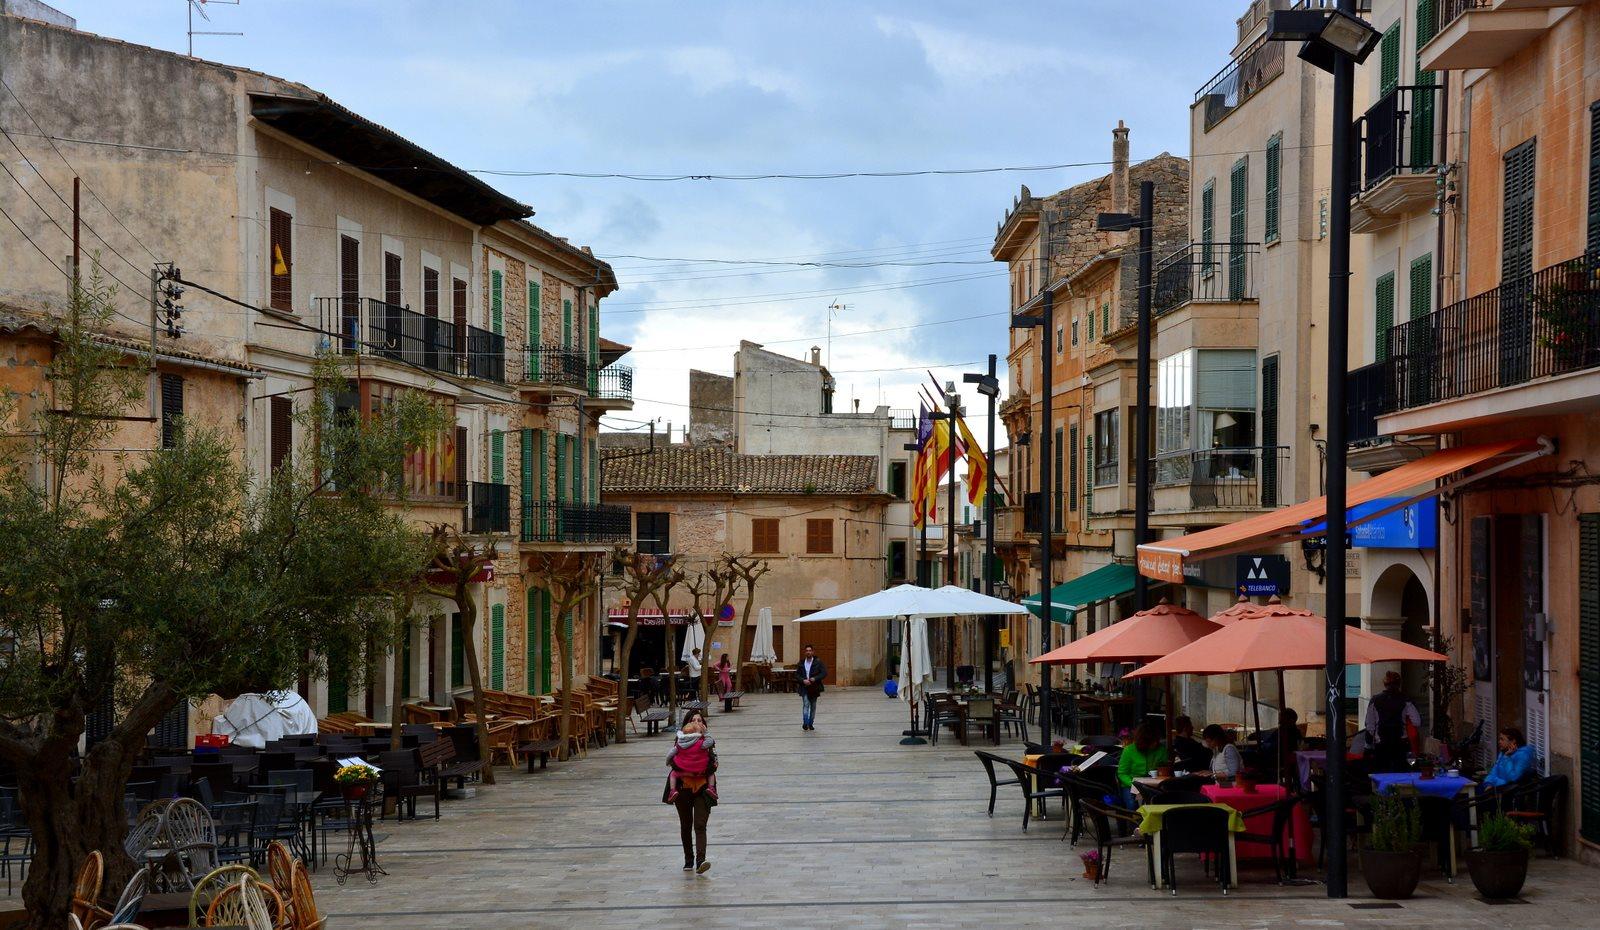 Mein perfektes Mallorca Wochenende staedtereisen sonne land und leute mallorca familie europa  tui berlin mallorca marktplatz santanvi